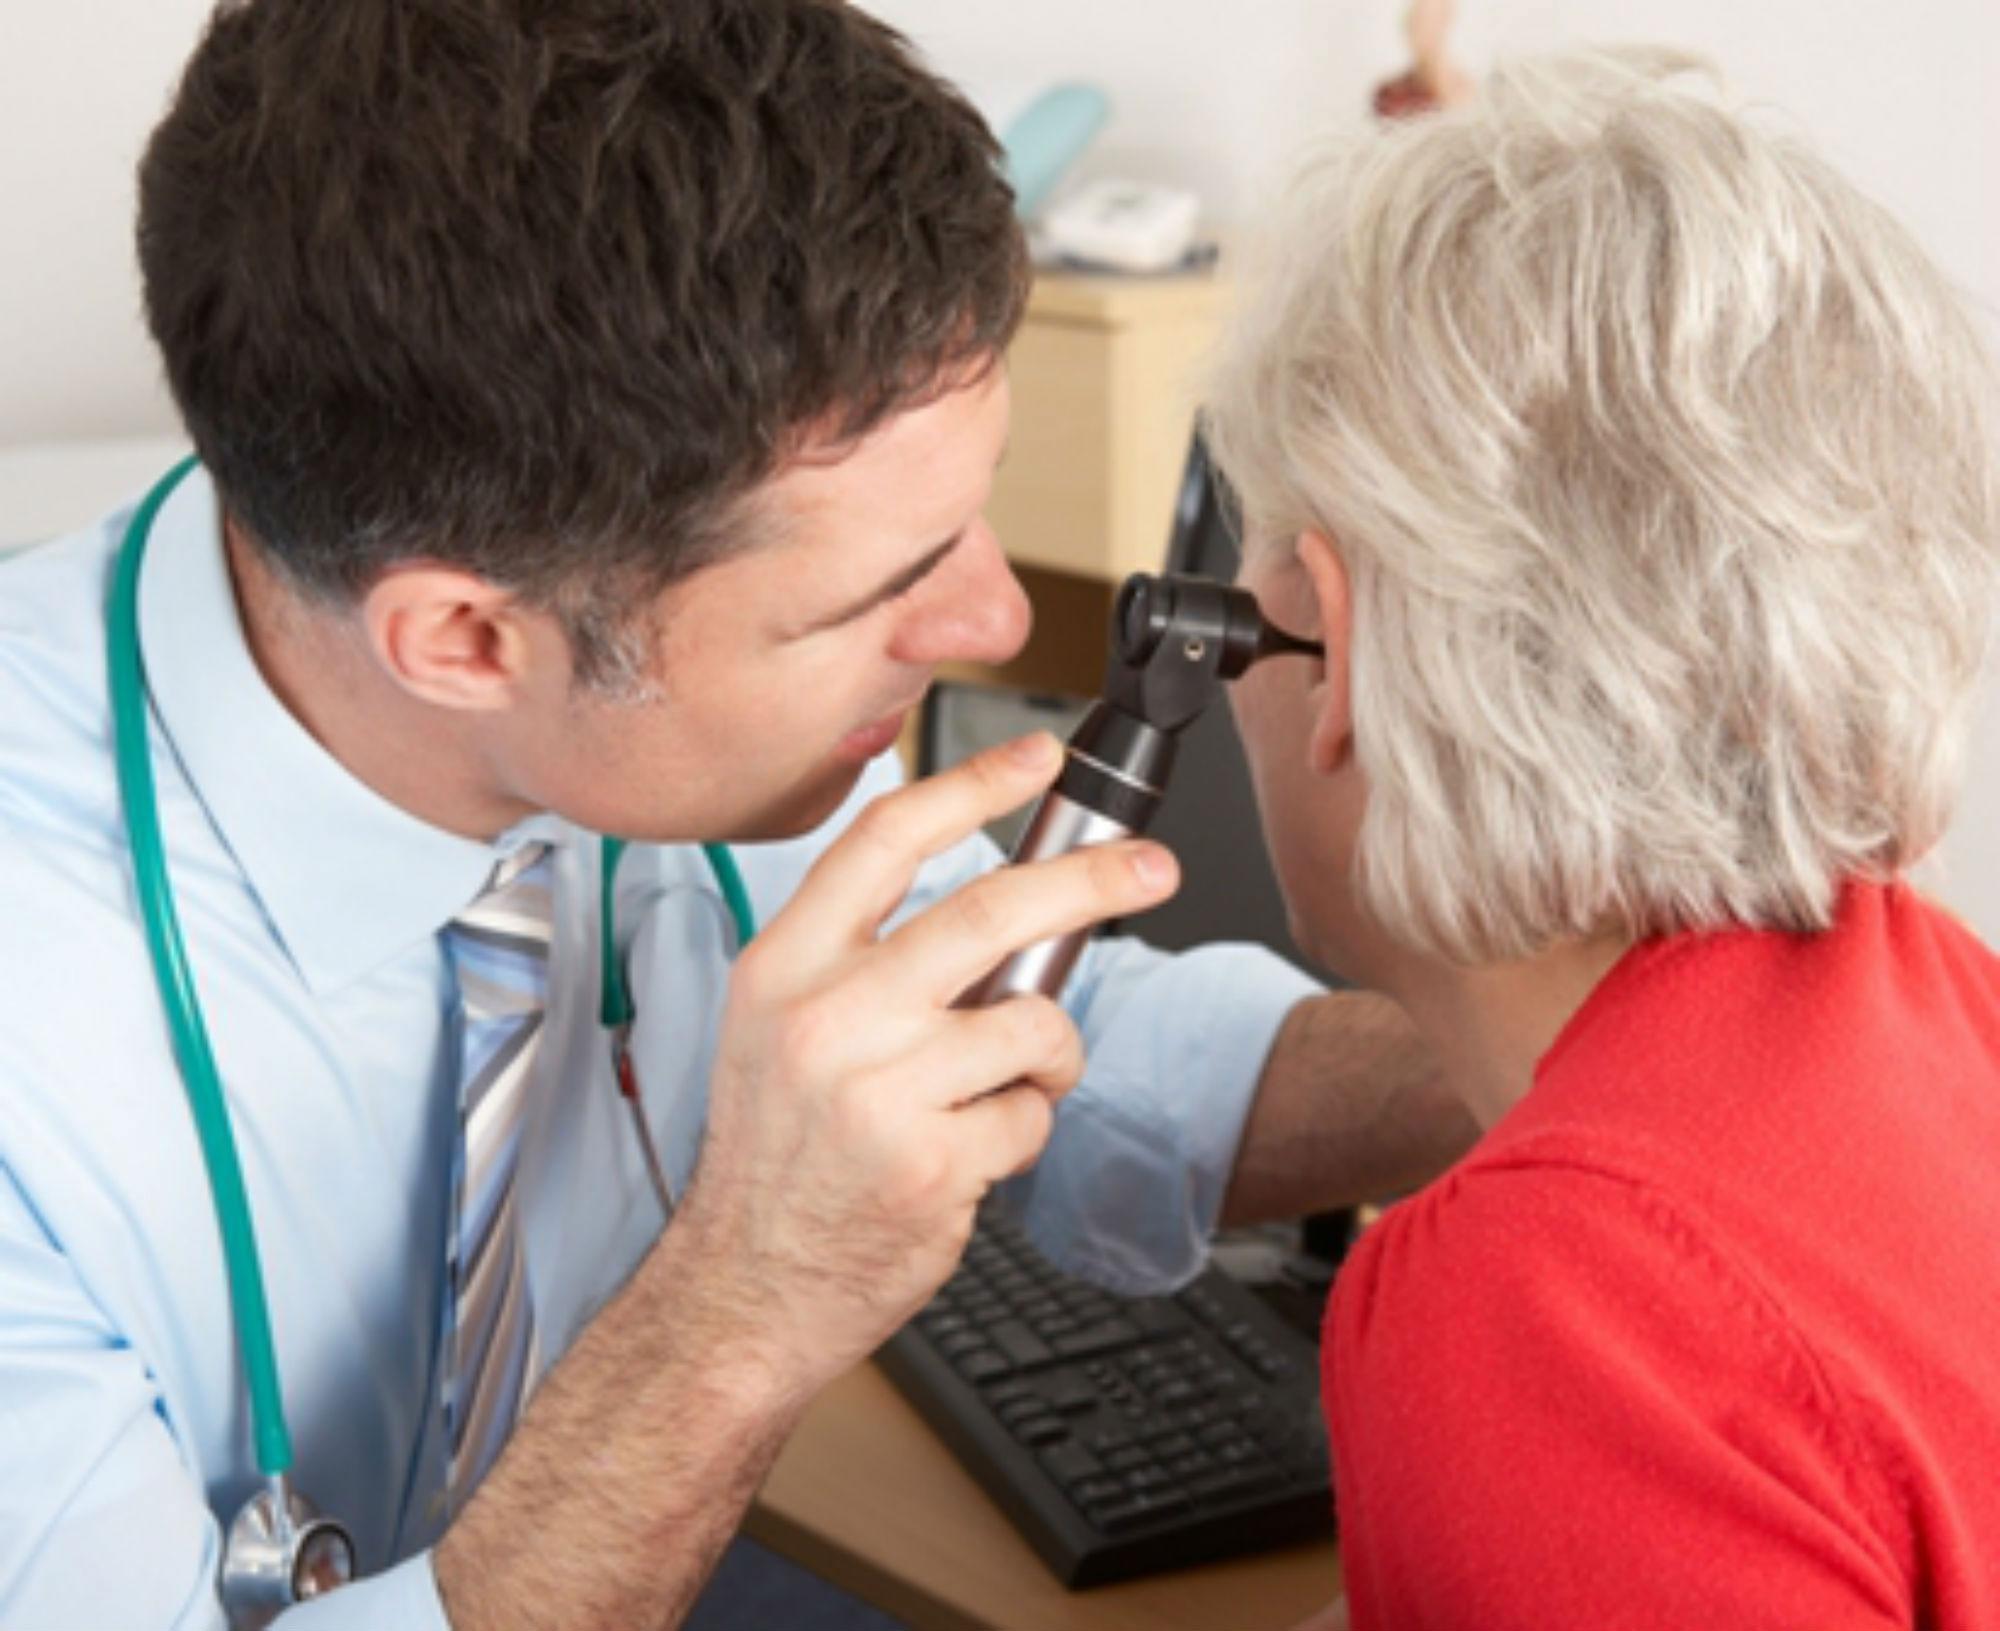 sindrome-usher-surdez-cegueira